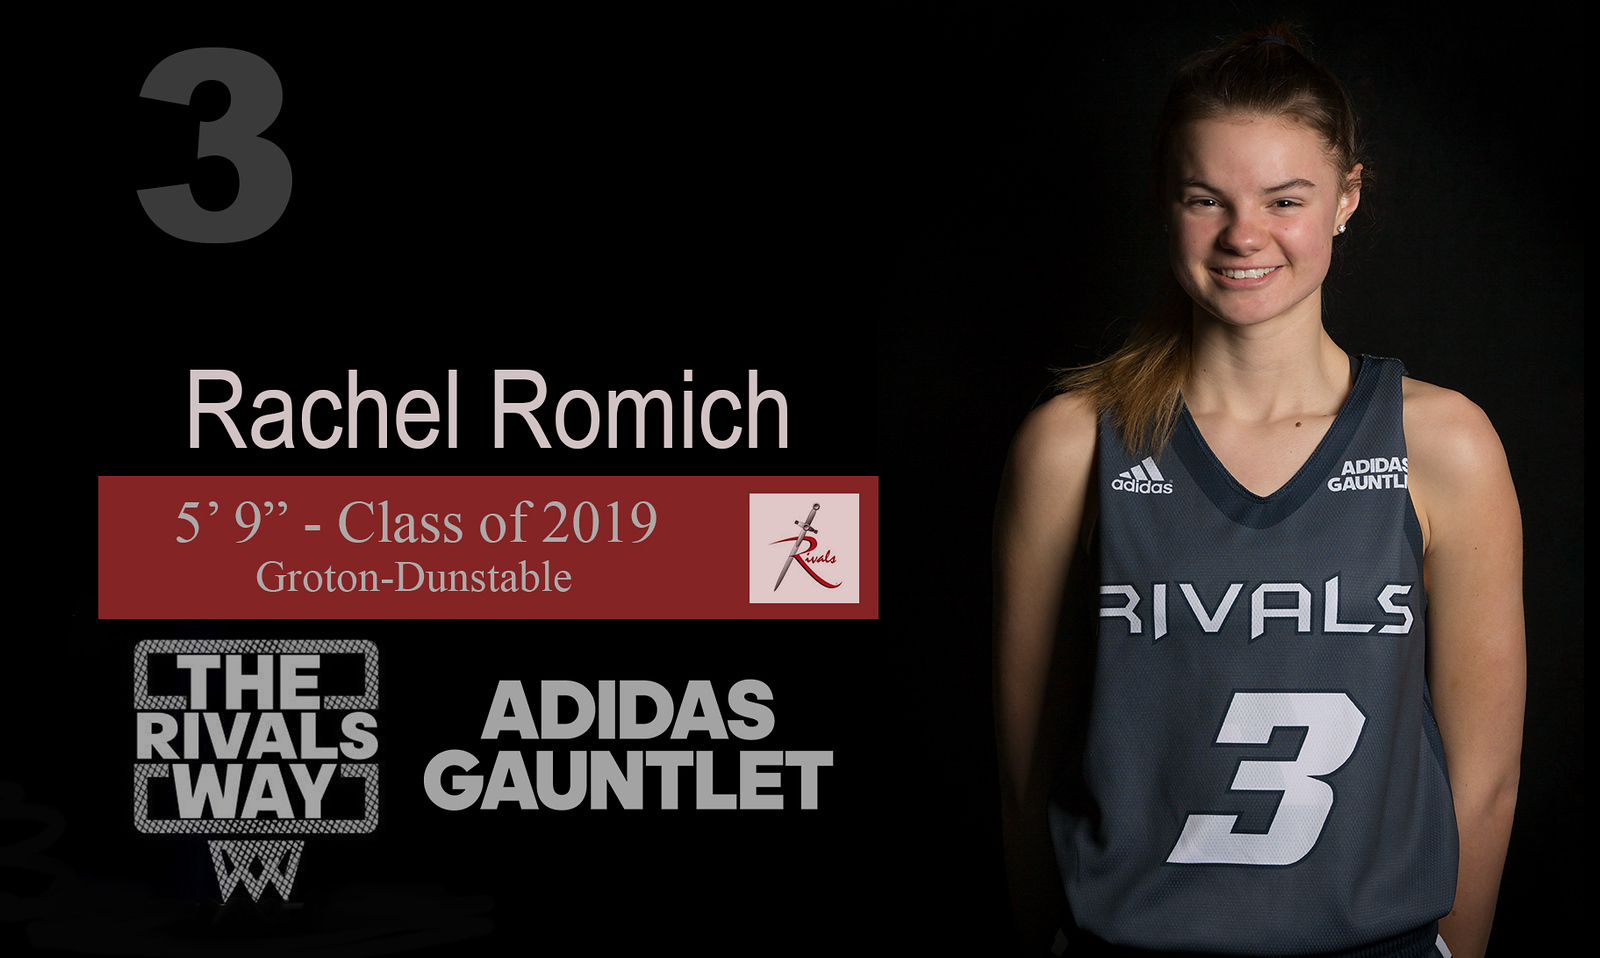 Rachel Romich